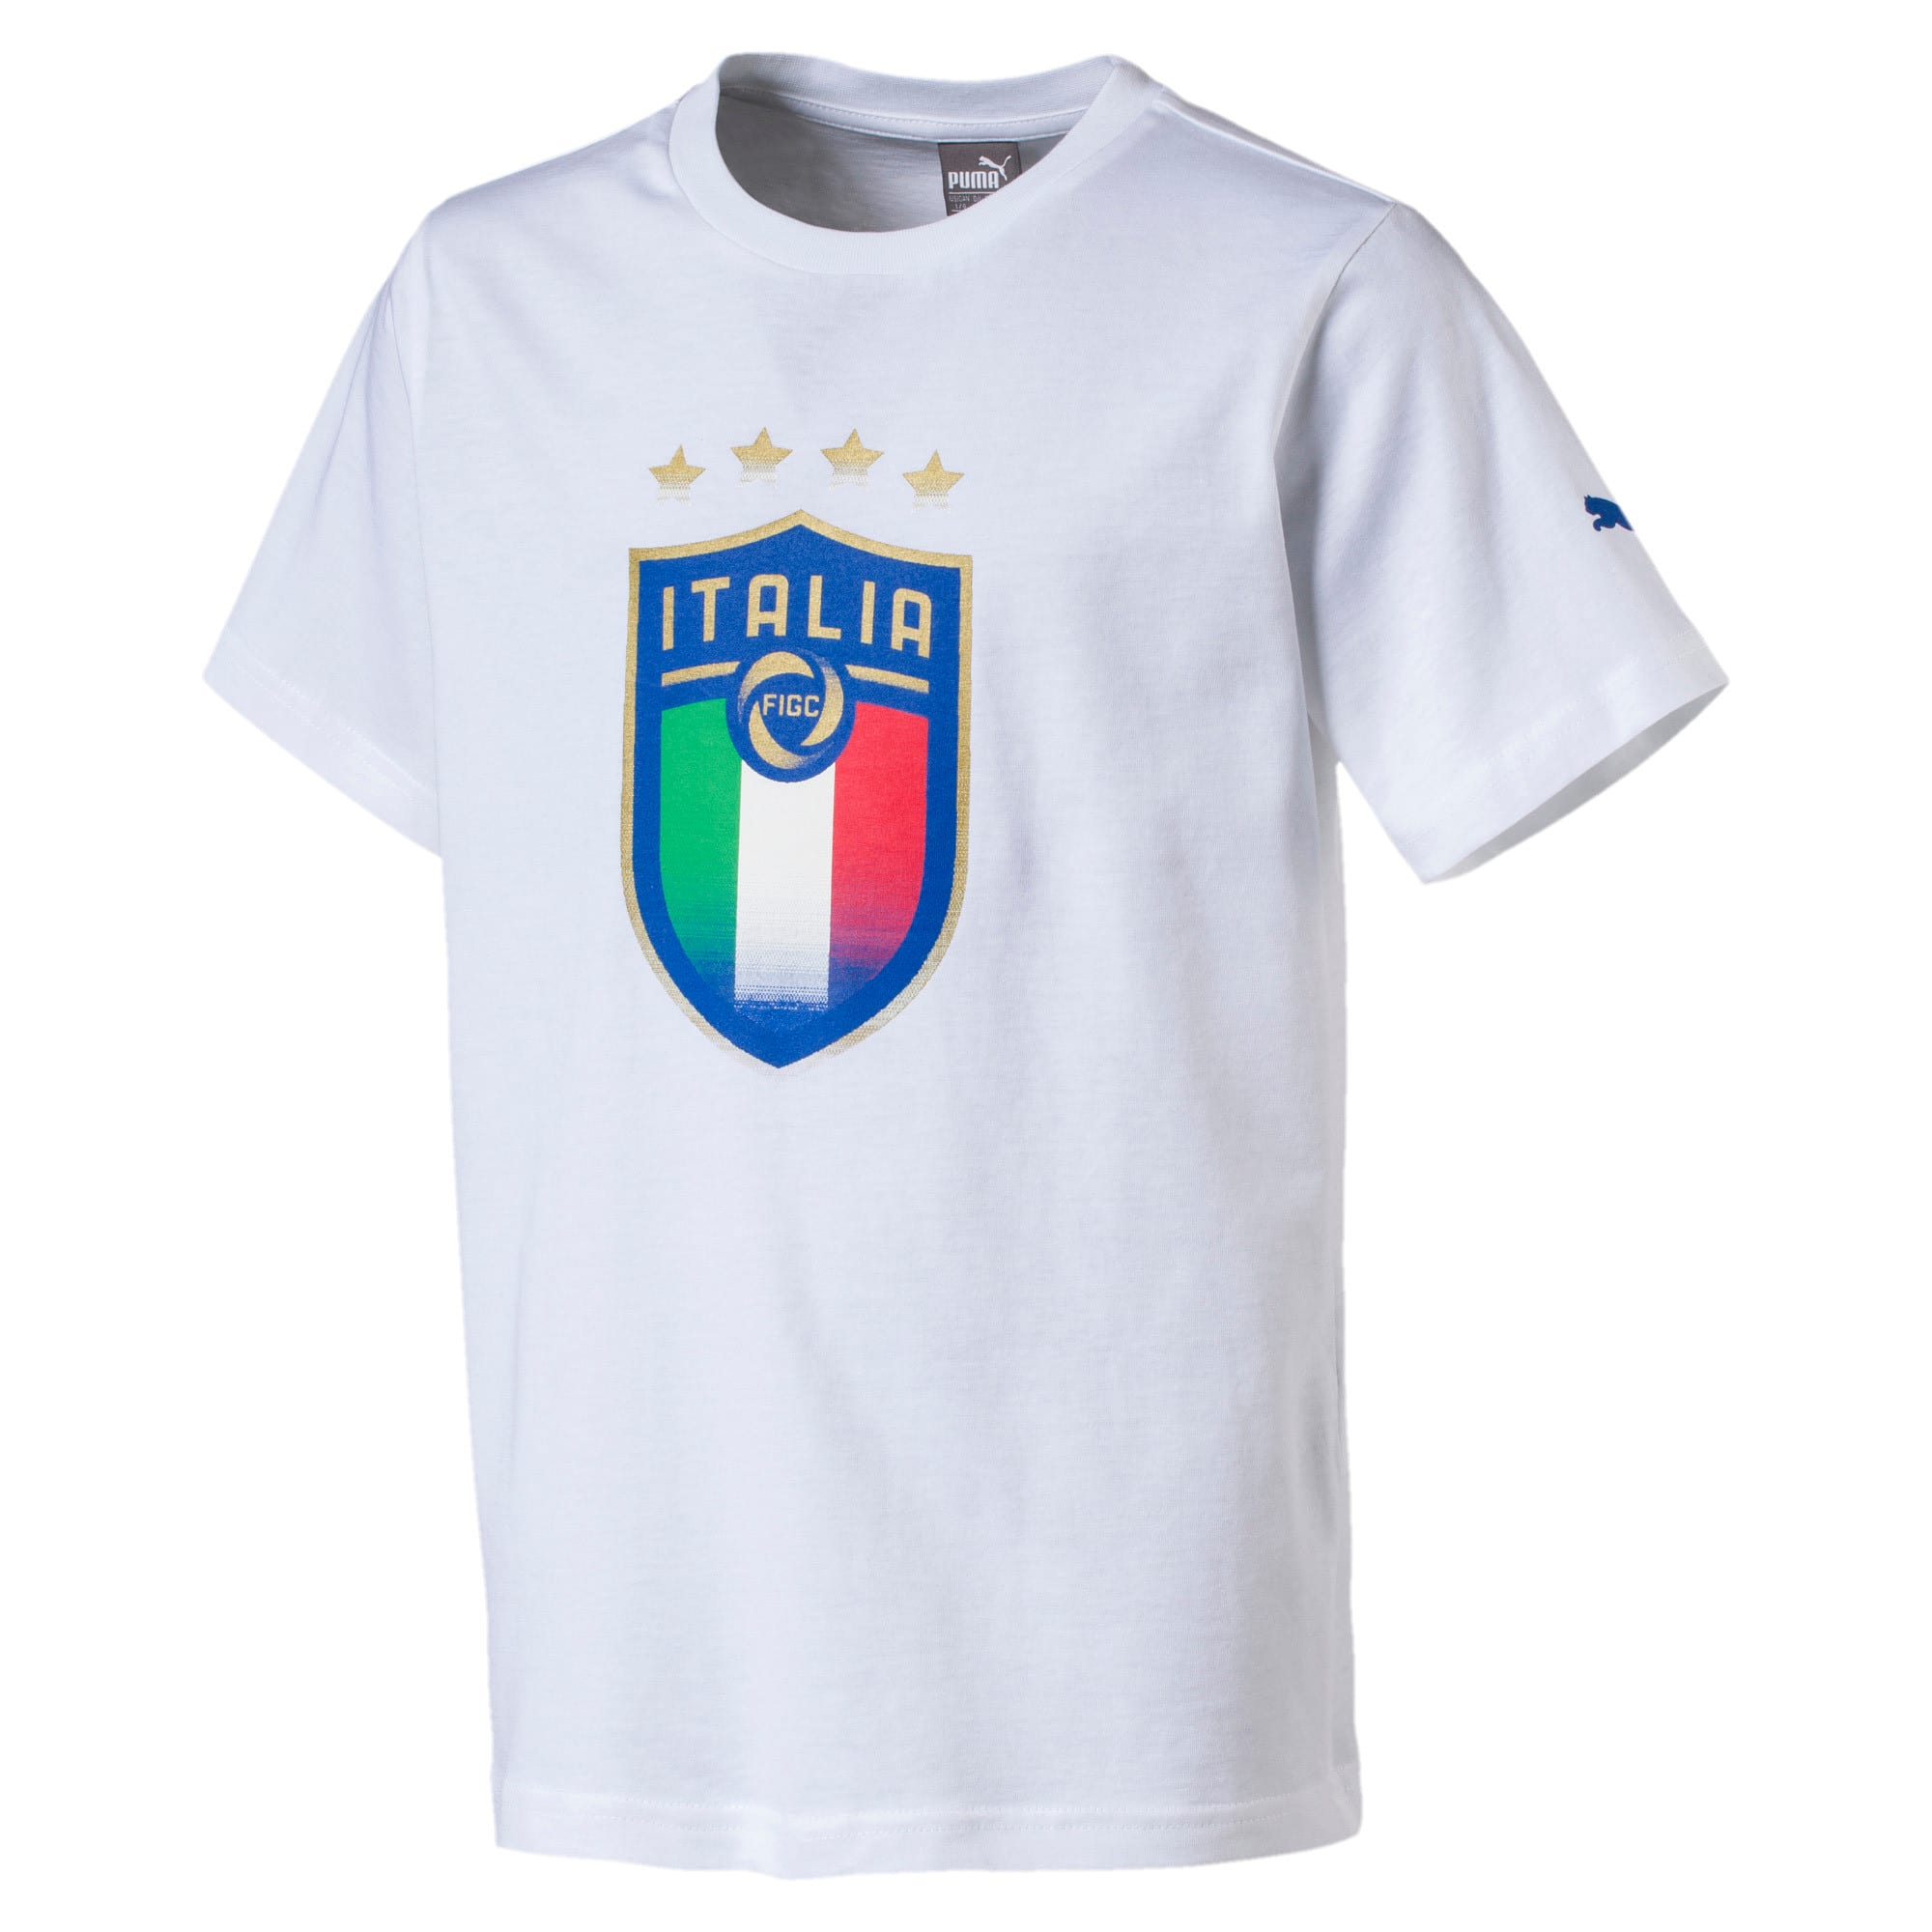 Thumbnail 3 of Italia Badge Tee Jr, Puma White, medium